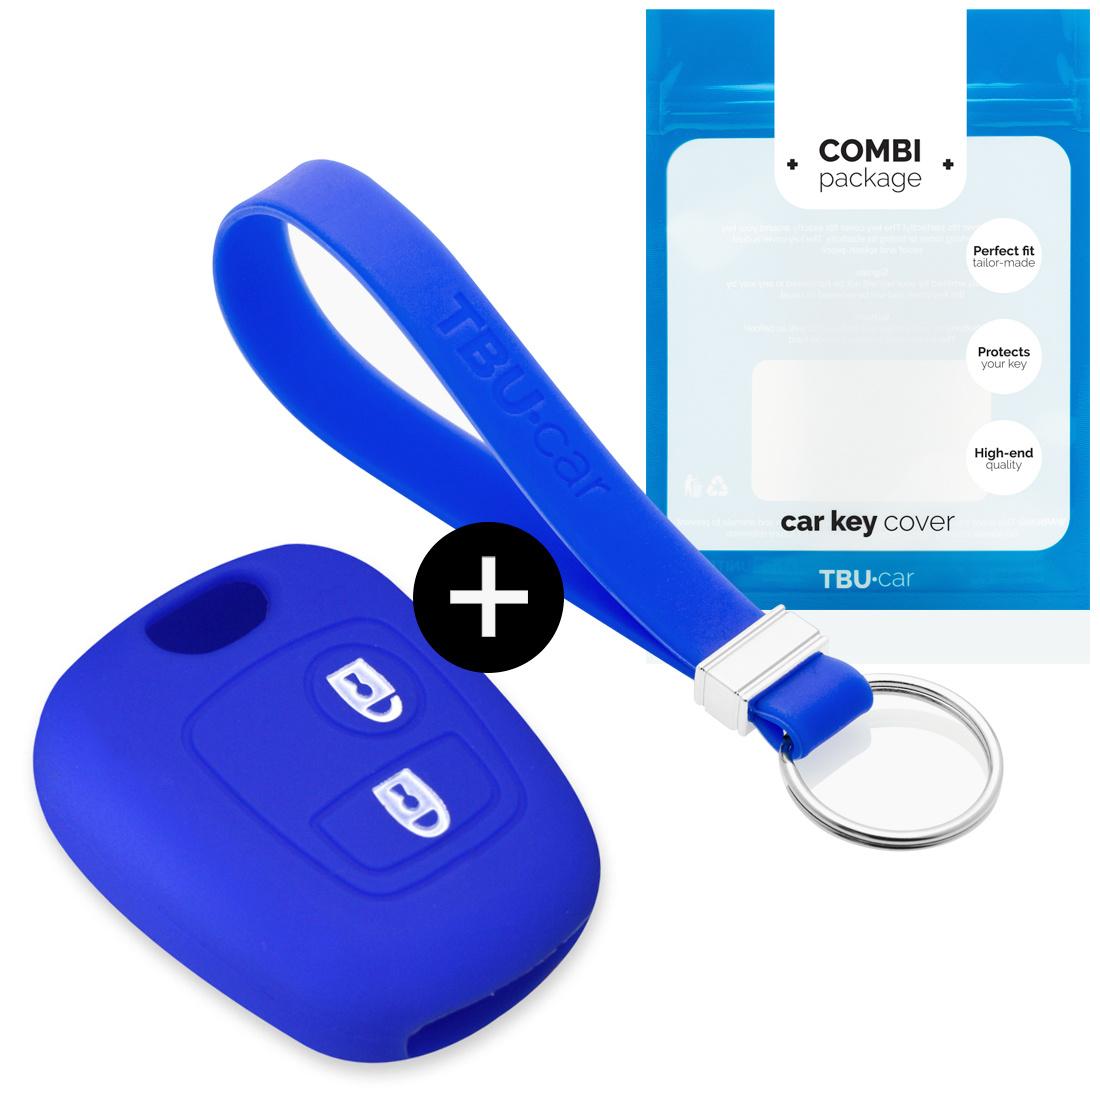 TBU car TBU car Sleutel cover compatibel met Peugeot - Silicone sleutelhoesje - beschermhoesje autosleutel - Blauw